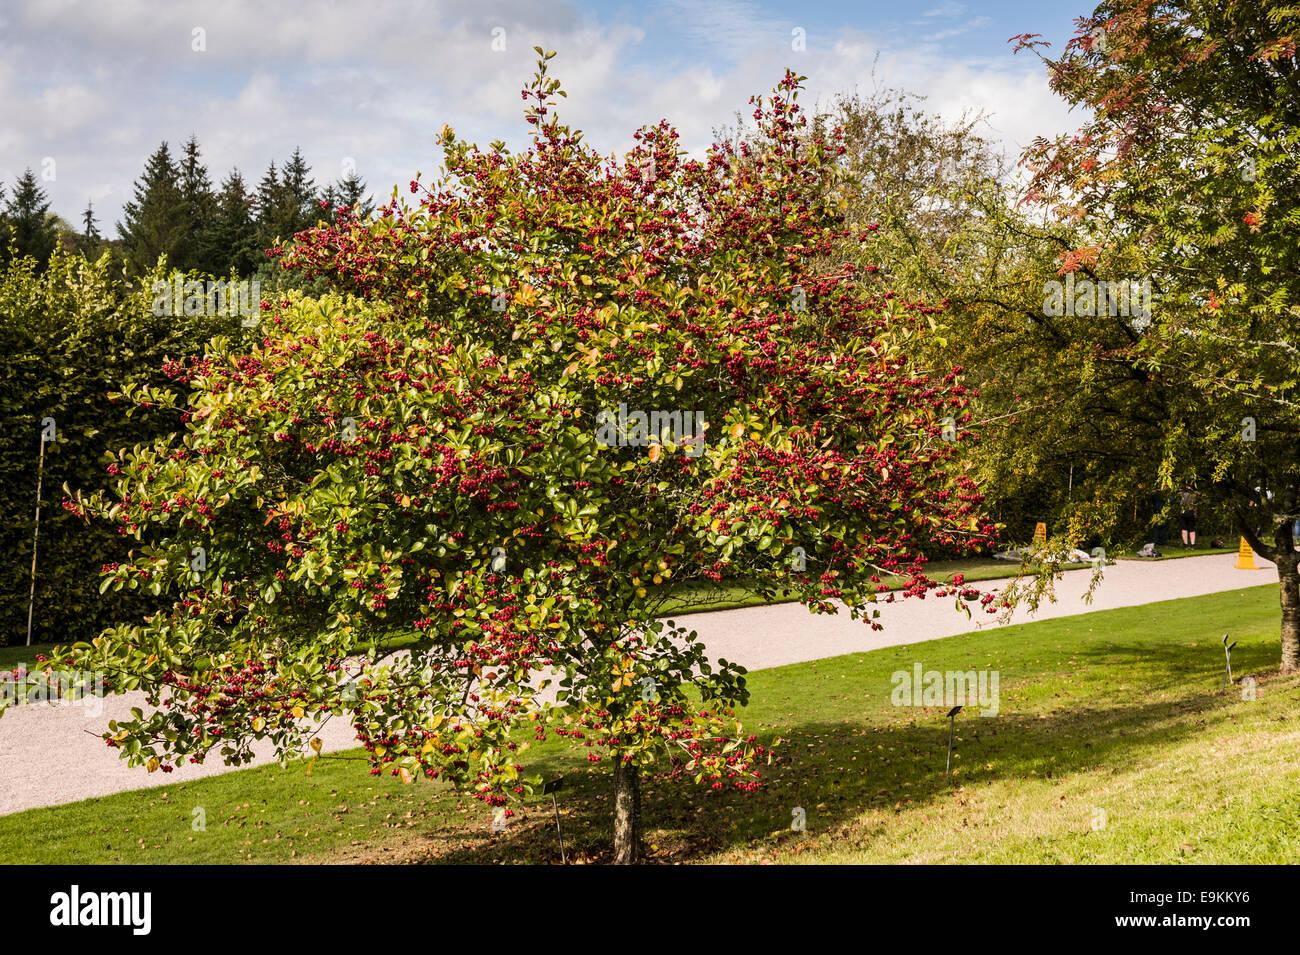 Crataegus persimilis Prunifolia, hawthorn tree in the autumn or fall - Stock Image